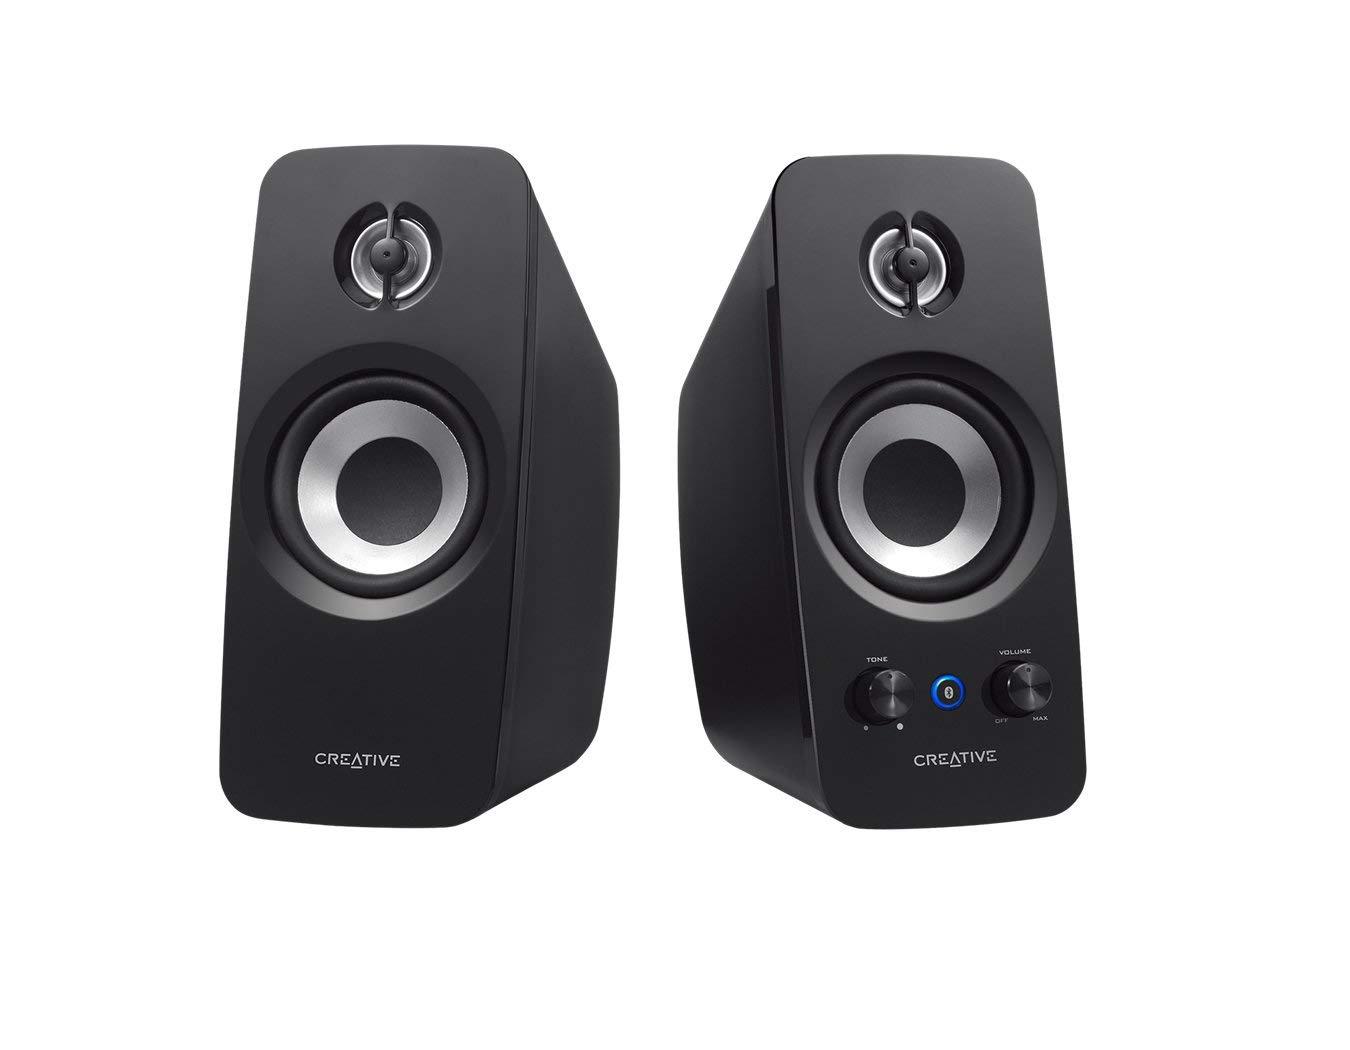 Creative T15 - 2.0 Bluetooth-Lautsprechersystem, schwarz (Zertifiziert und Generalü berholt)